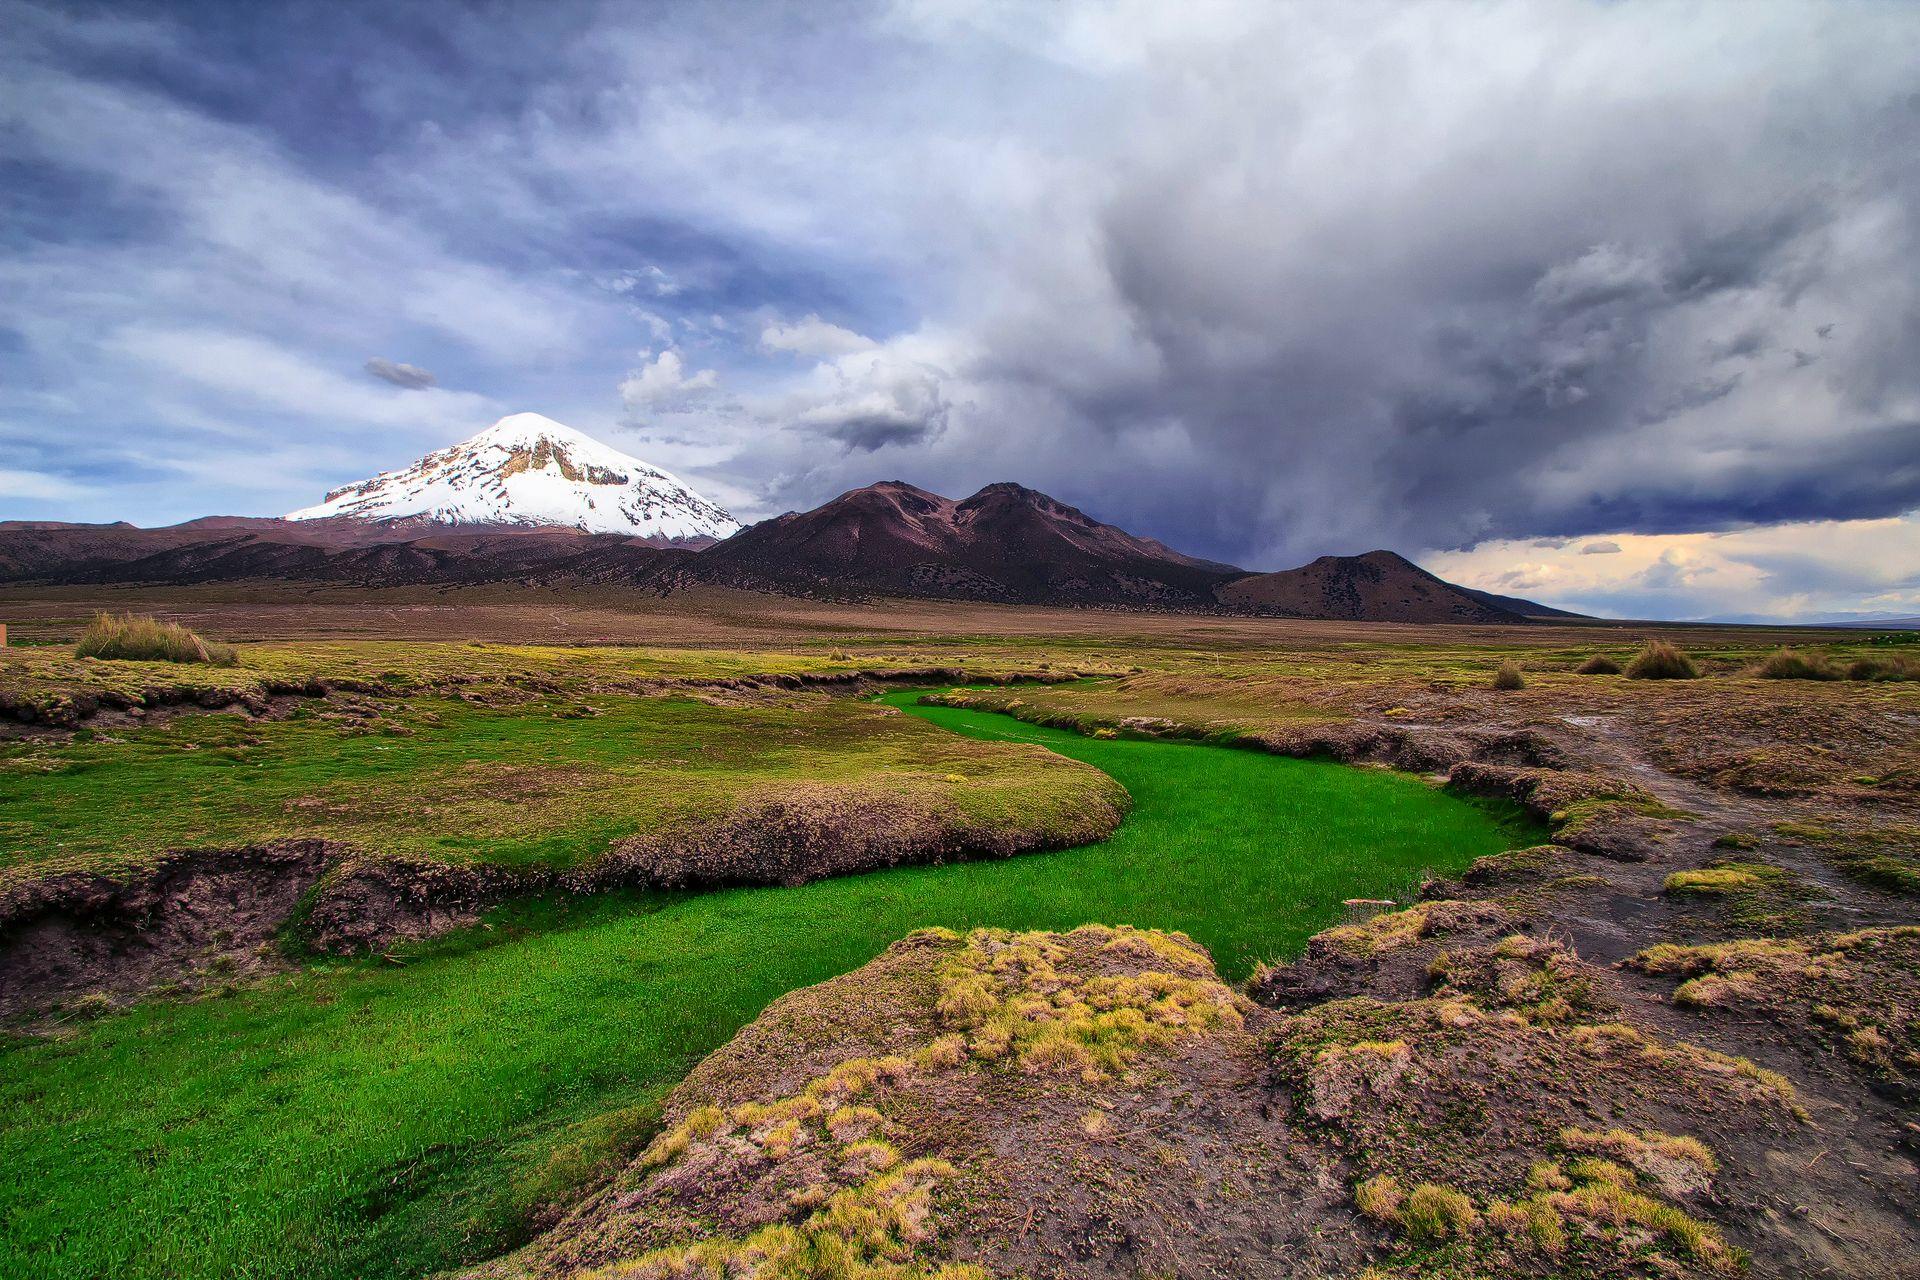 Green River filled with gras, Nevado Sajama, Oruro Department, Bolivia, landscape, huge clouds